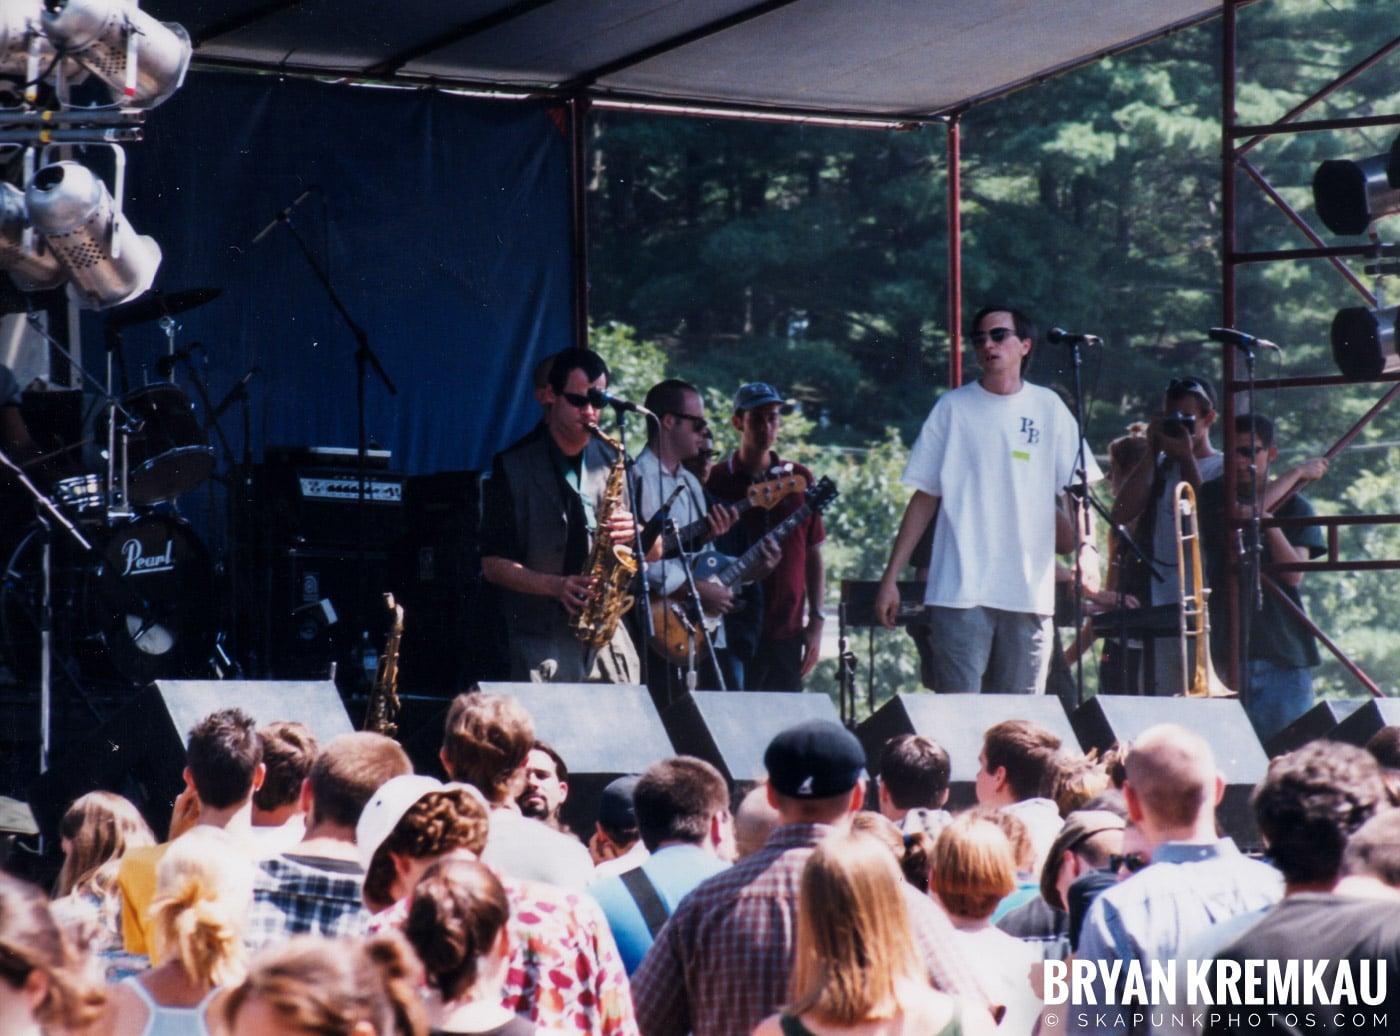 New York Ska Jazz Ensemble @ New England Ska Fest 98, Westford, MA - 8.22.98 (9)